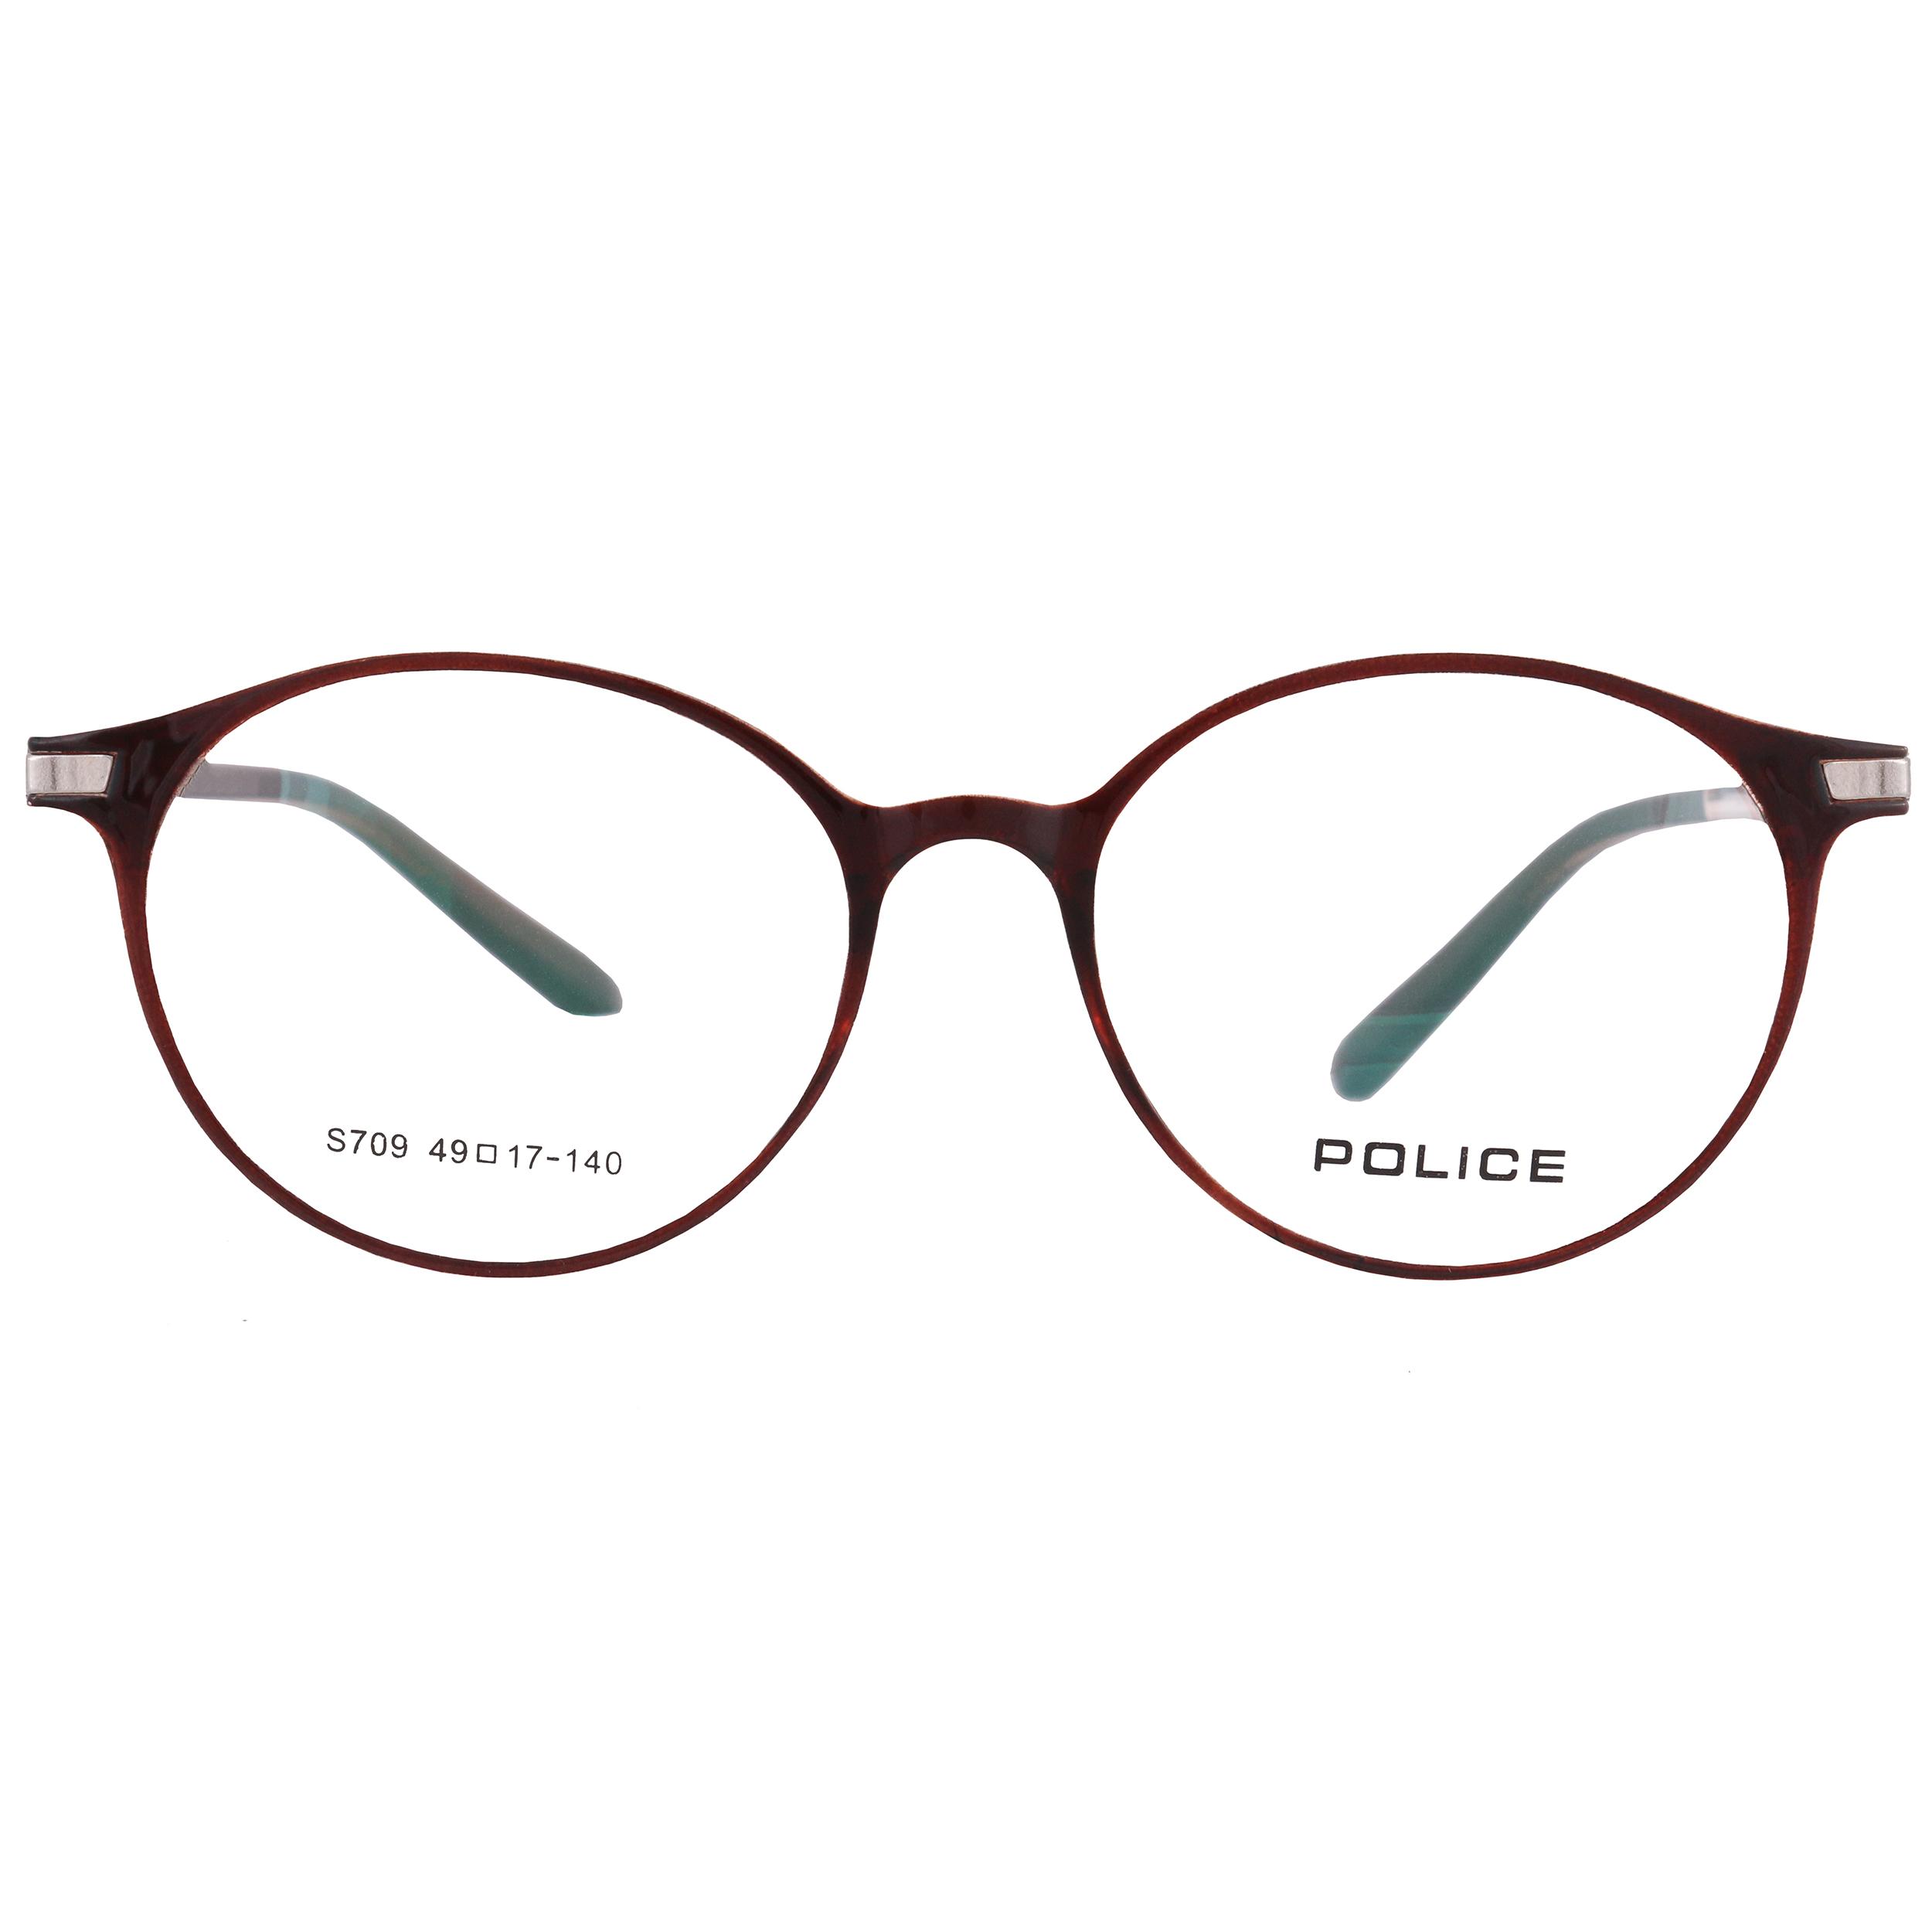 فریم عینک طبی پلیس مدل 360S709BN